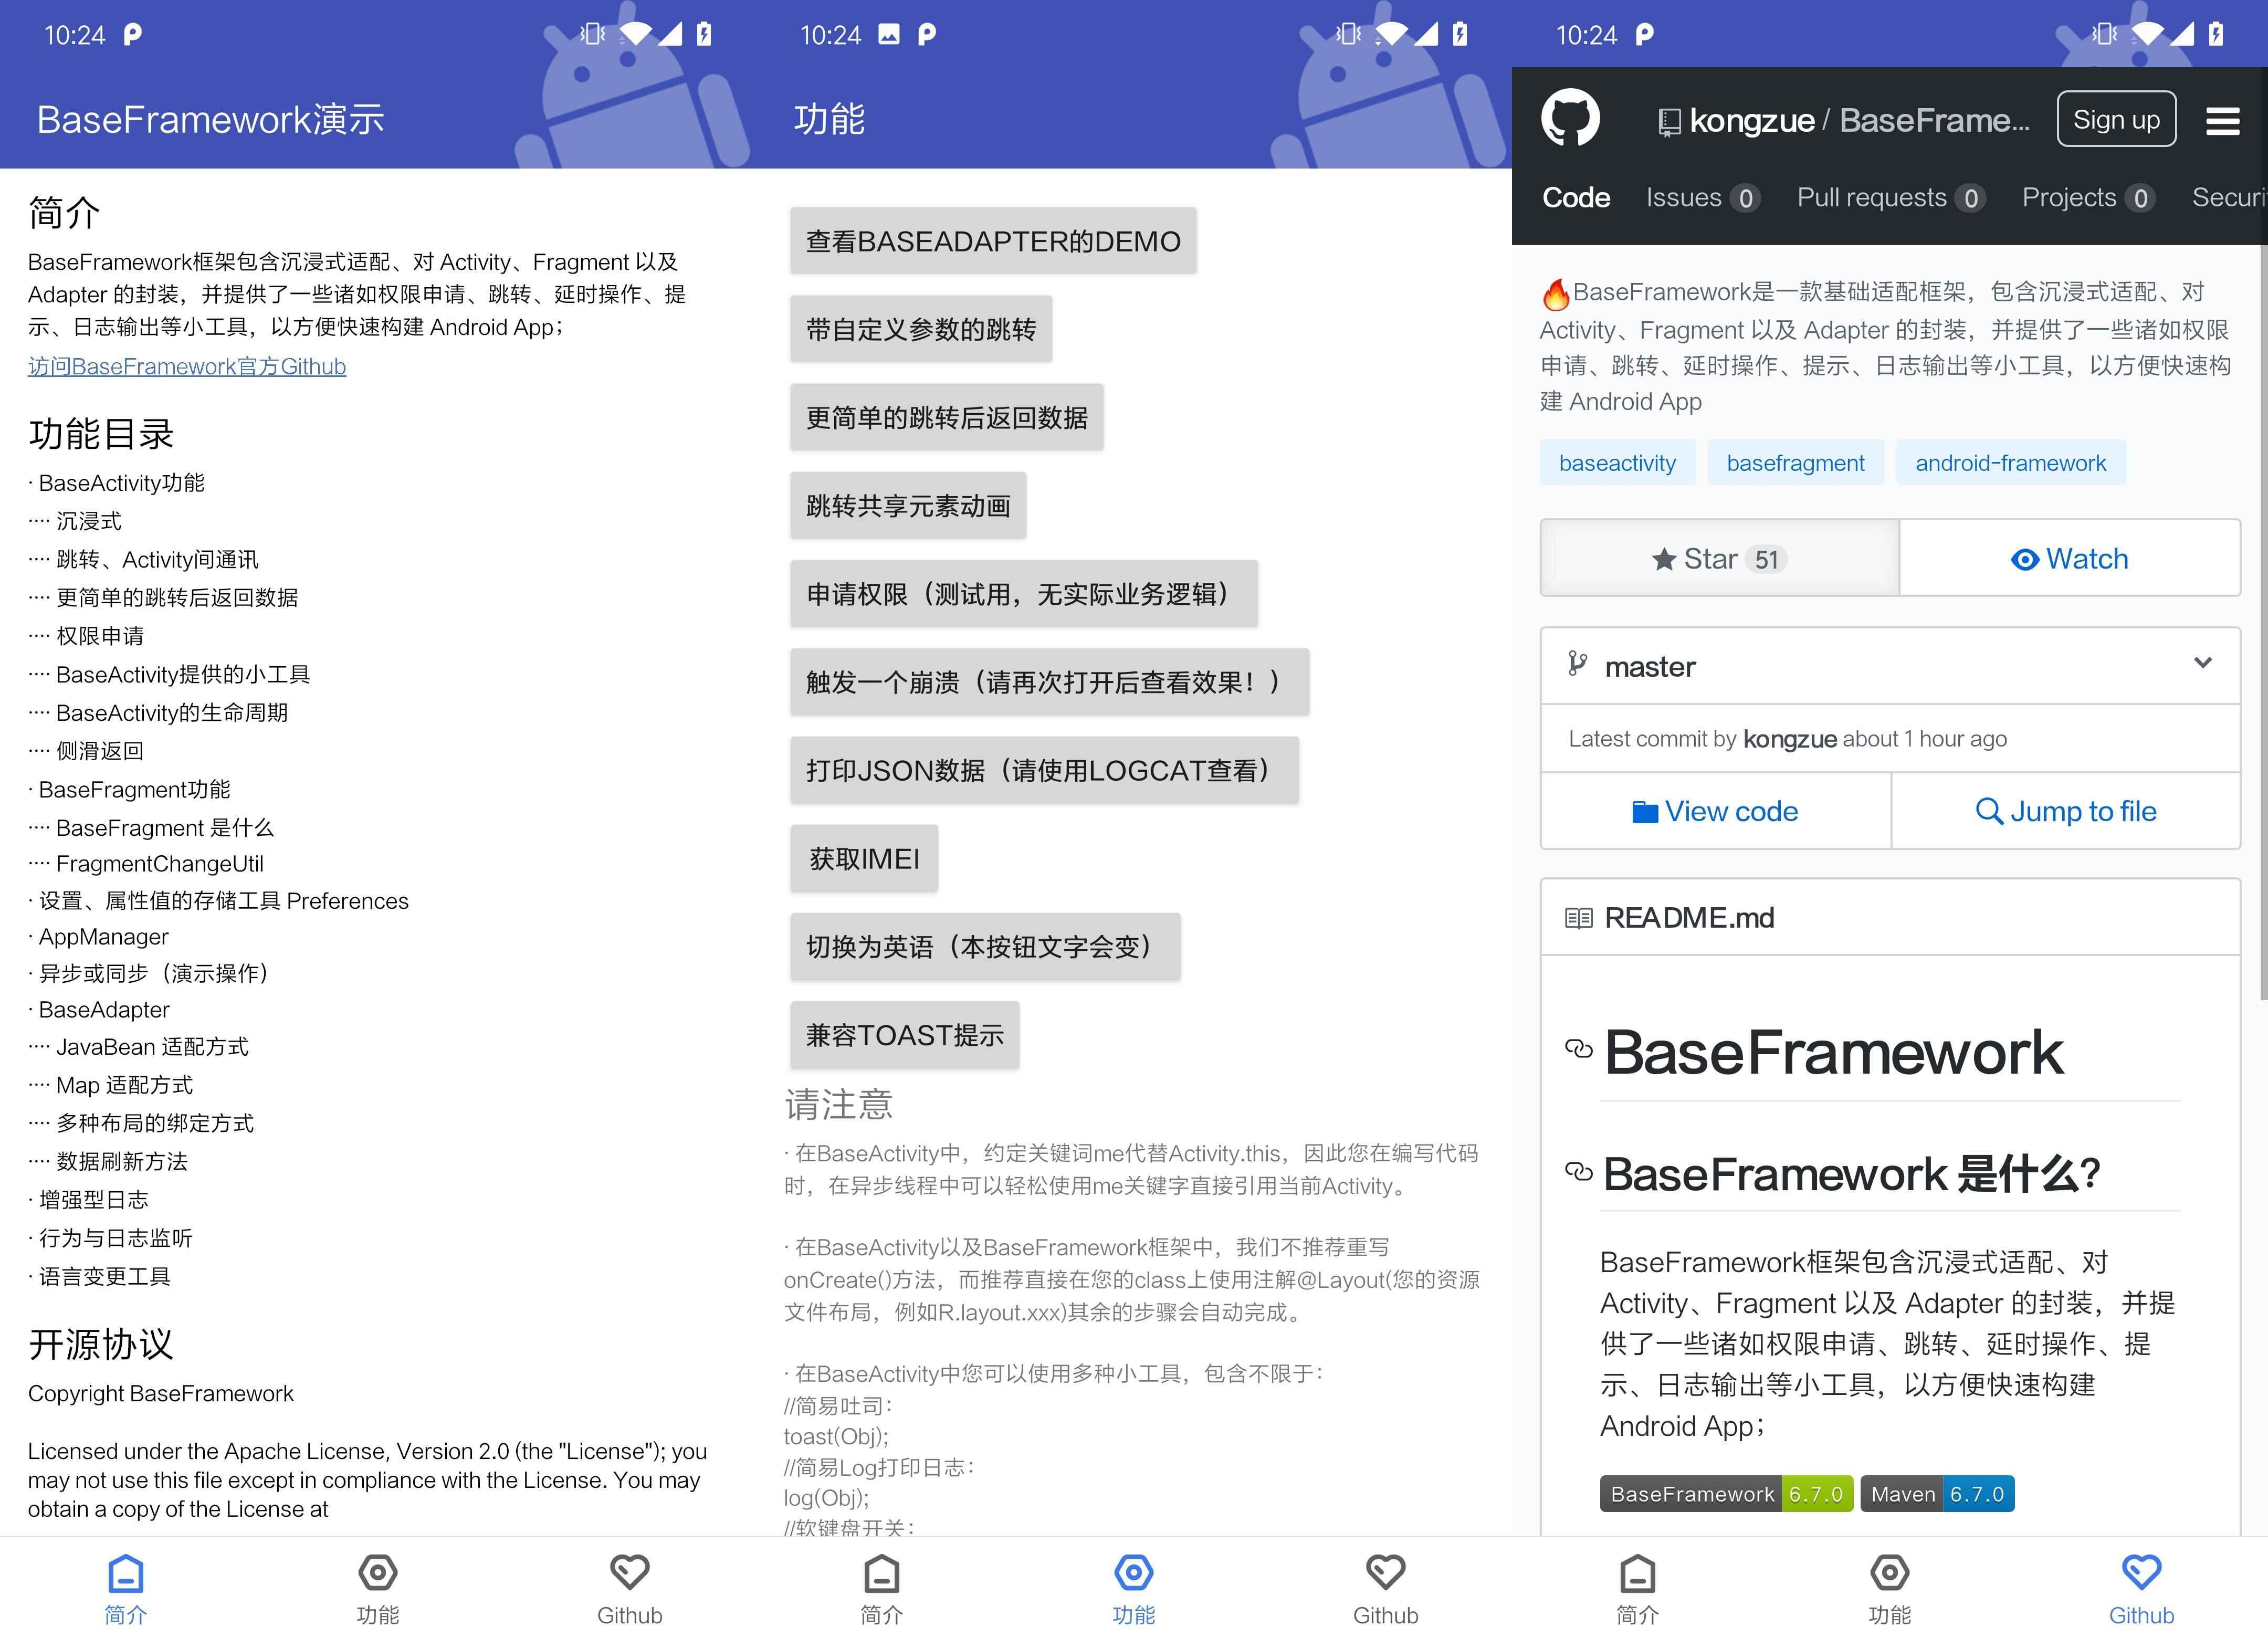 BaseFramework